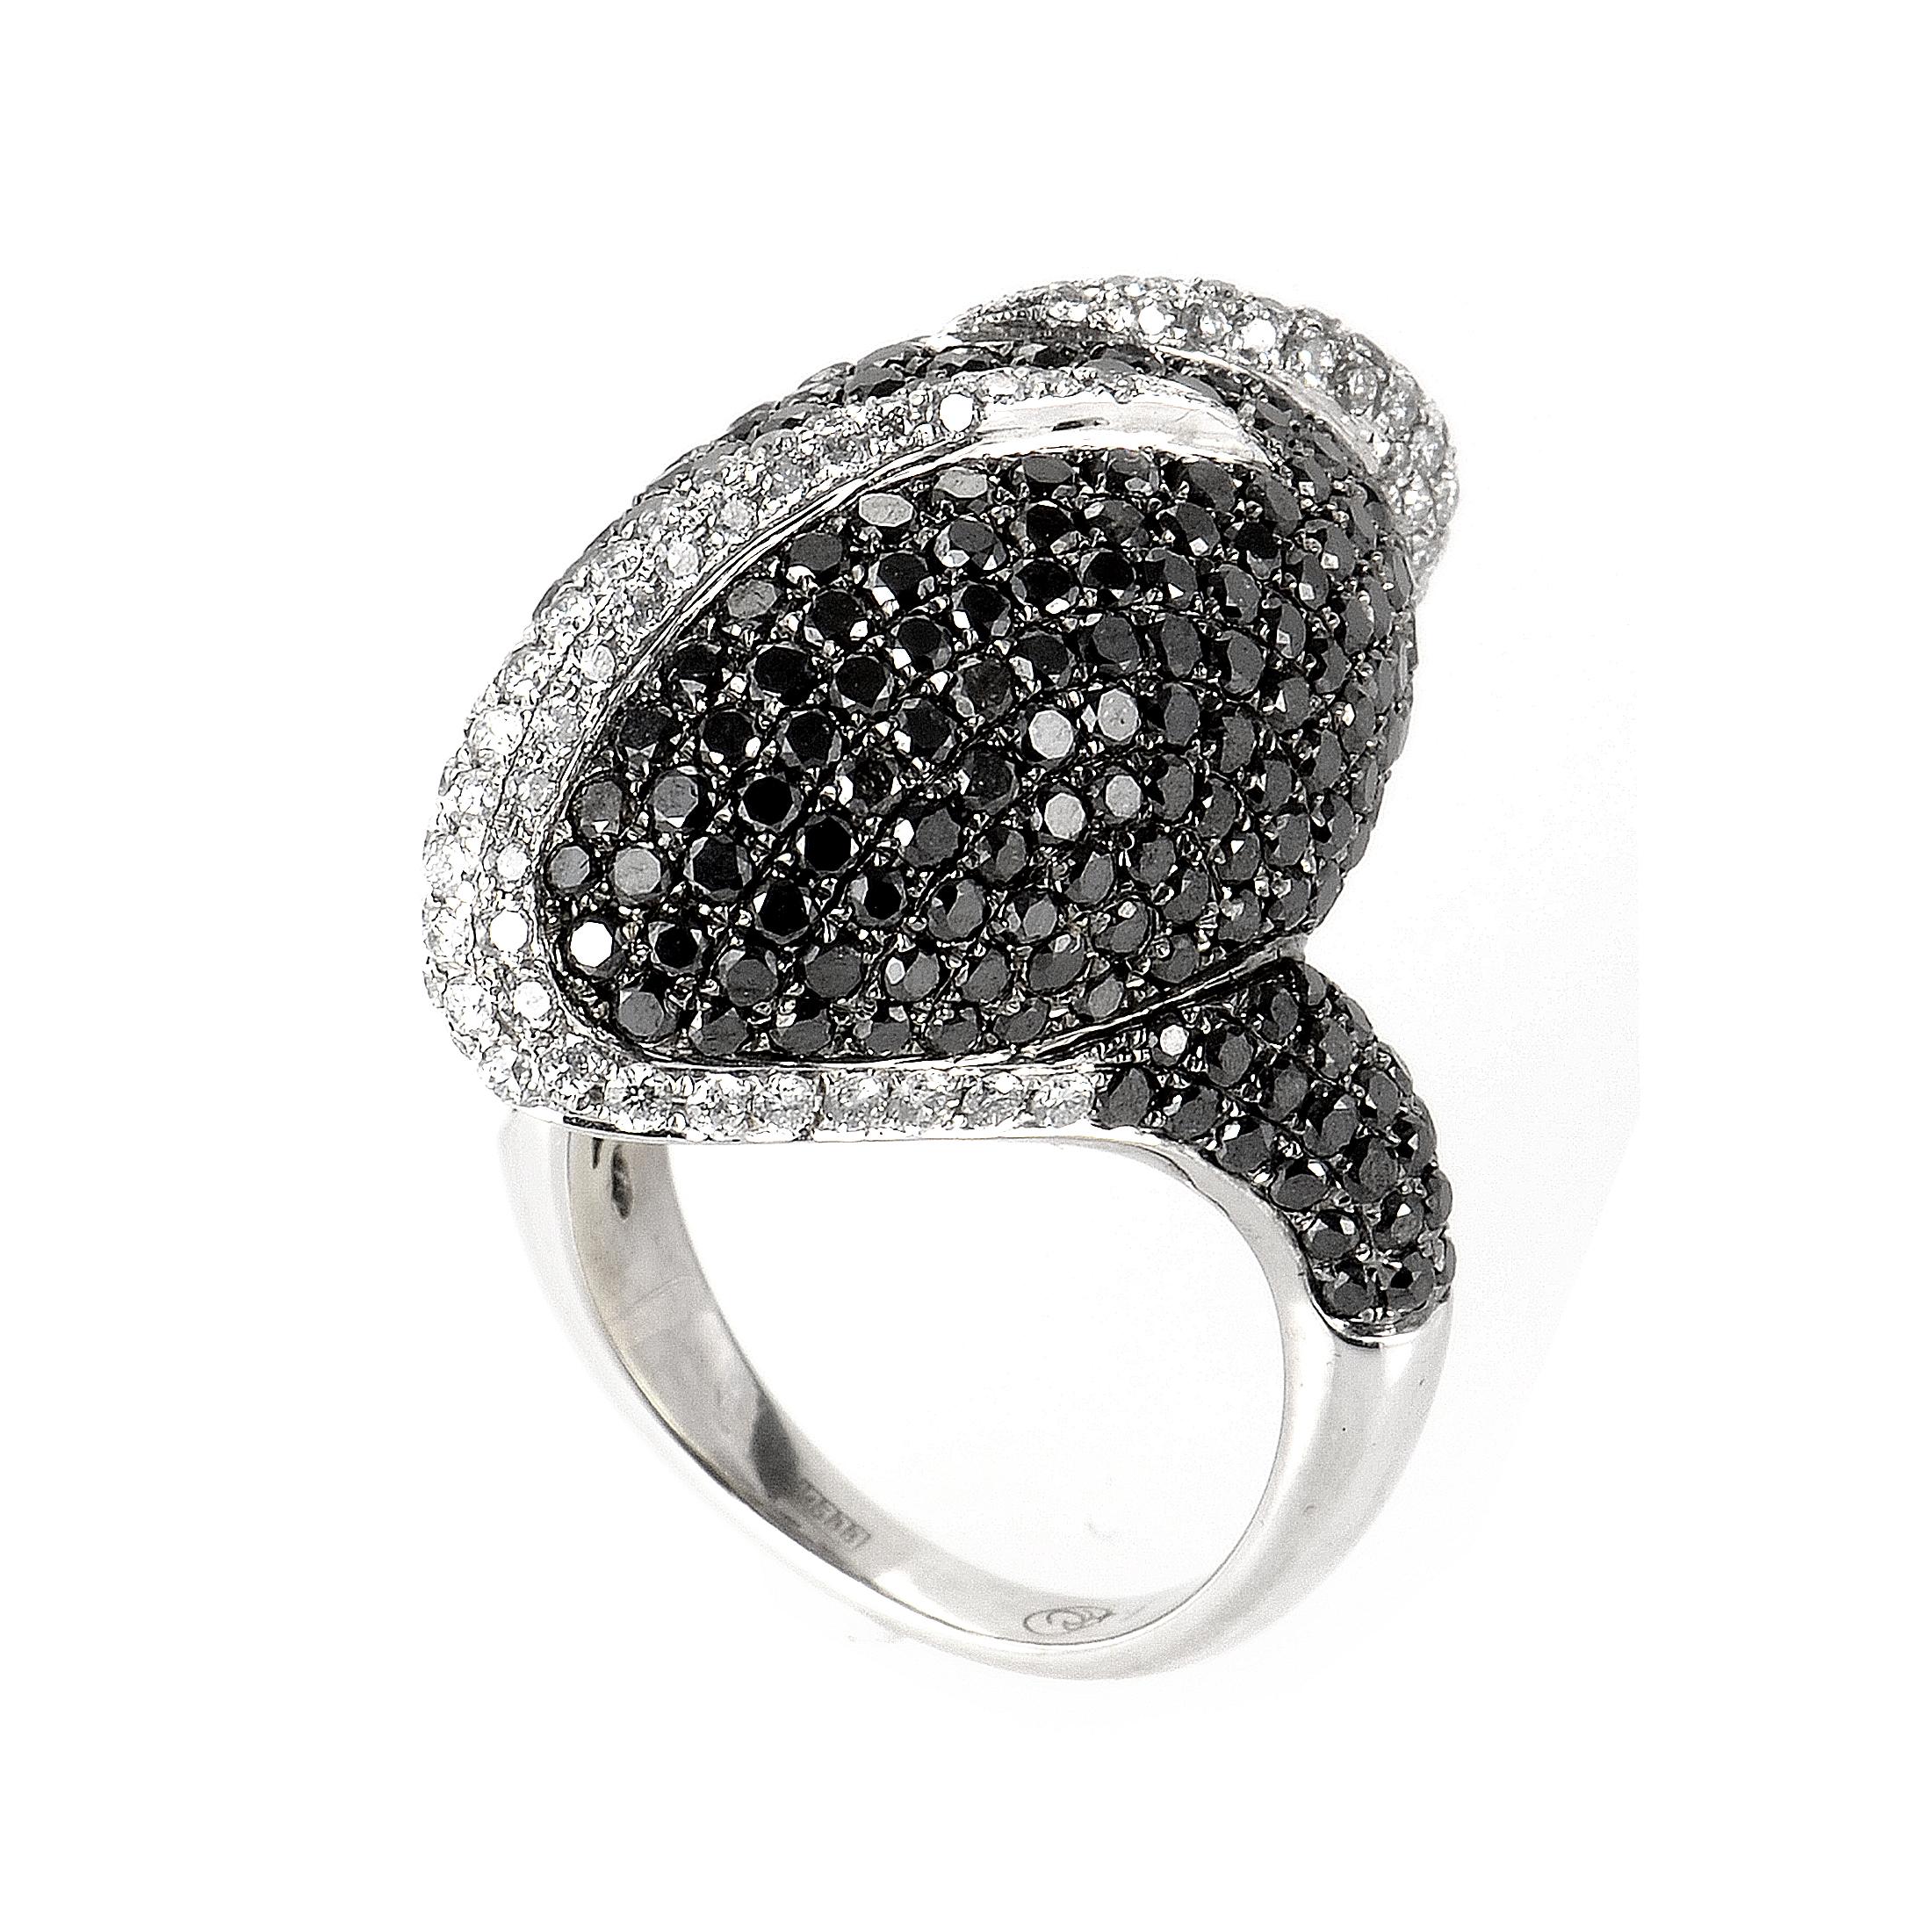 18K White Gold Black and White Swirl Diamond Ring CRR7207